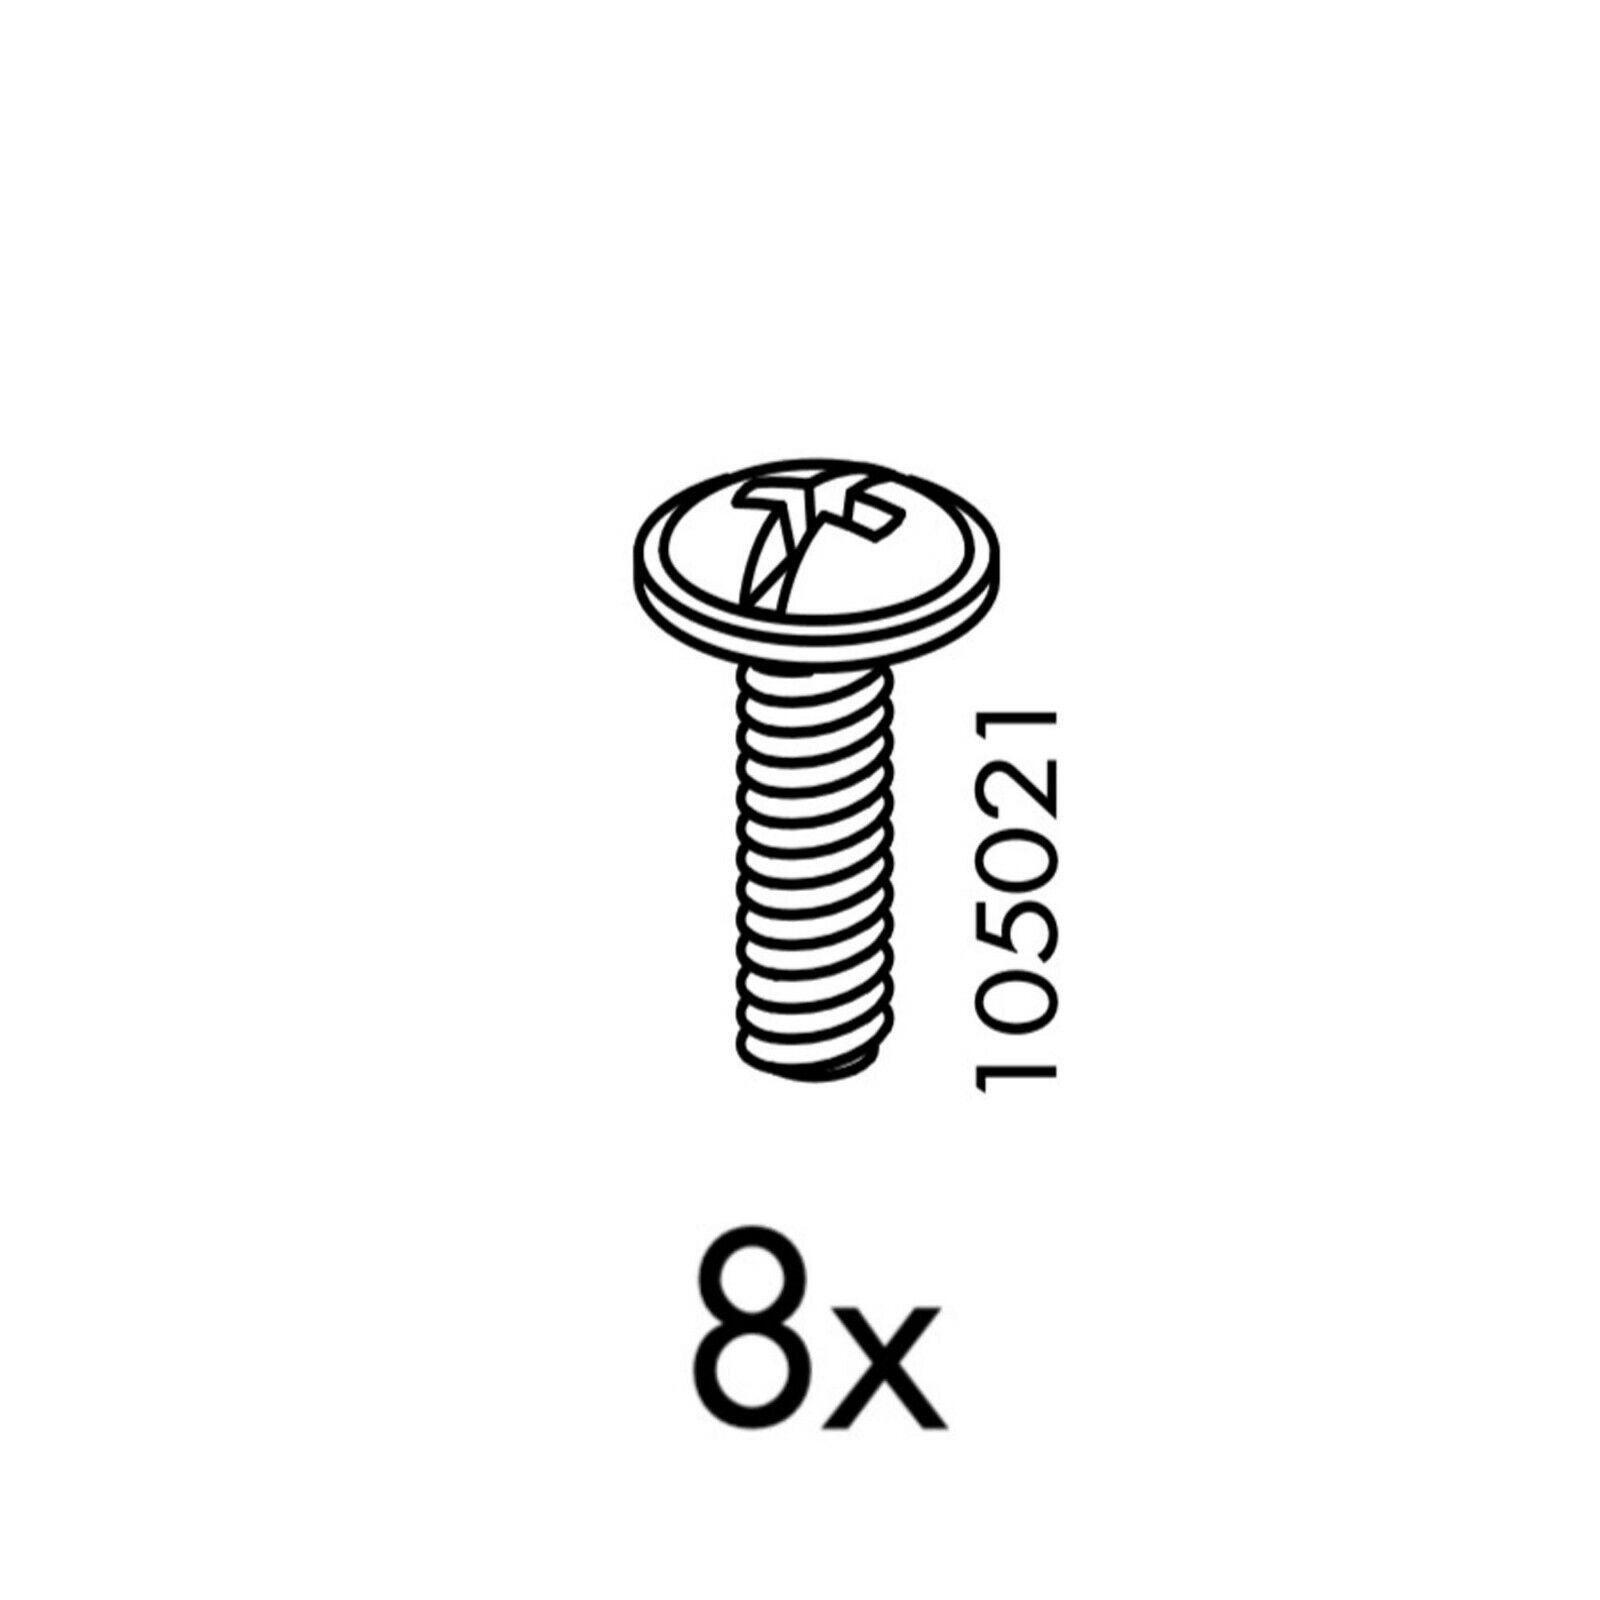 4 PACK IKEA Screw 100325 Round Head Euro Screws Steel 18mm Replacement Part